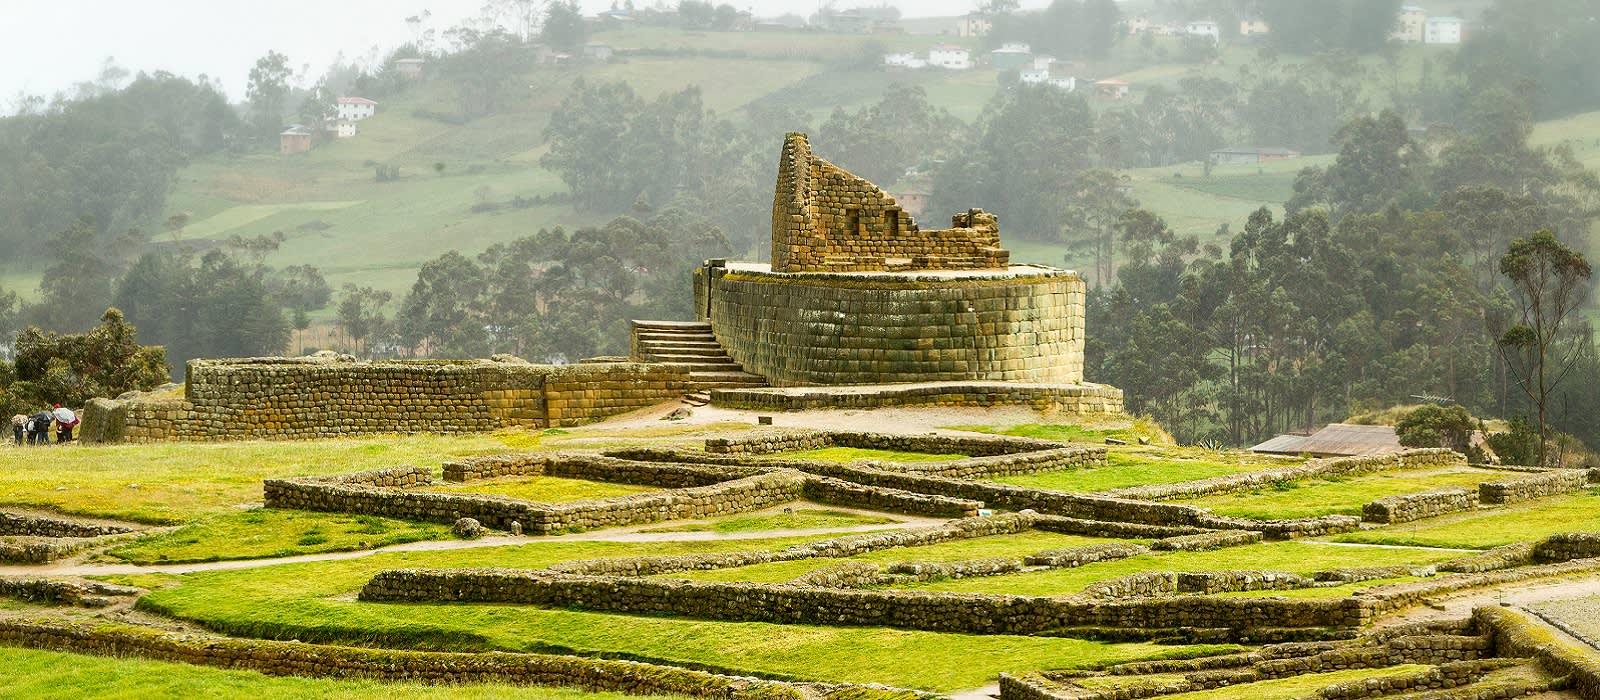 history of Ecuador - Enchanting Travels Ecuador Tours INGAPIRCA RUINS, THE MOST IMPORTANT INCA CIVILIZATION CONSTRUCTIONS IN MODERN ECUADOR South America